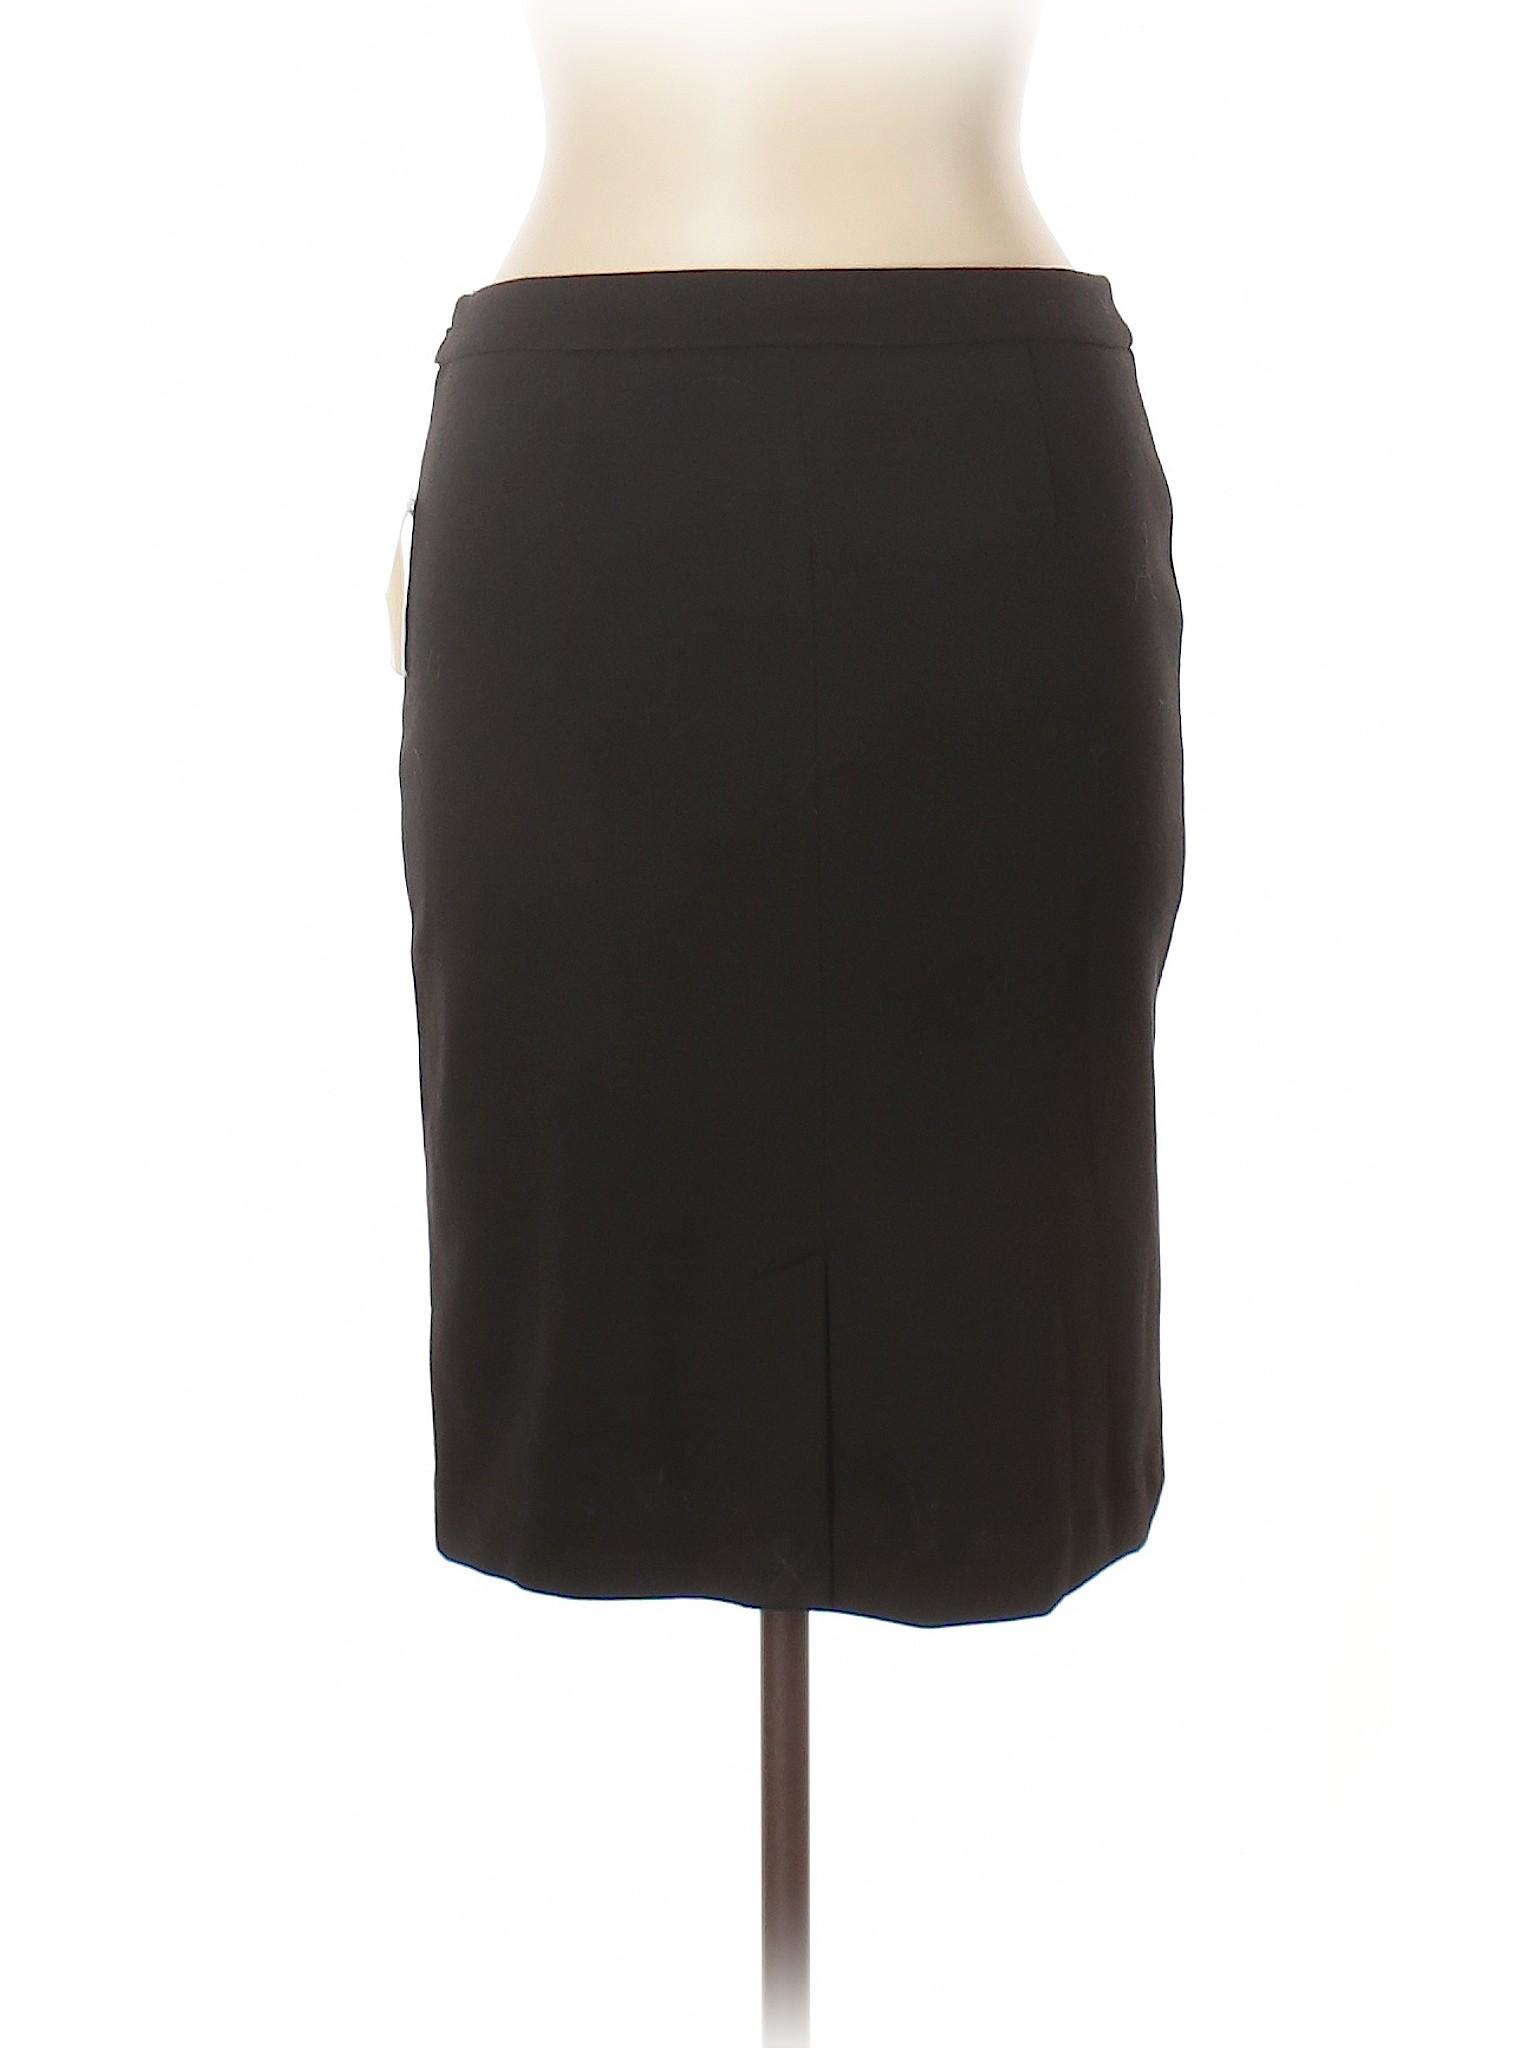 Skirt Casual Boutique Boutique Casual Boutique Boutique Skirt Skirt Casual RWxXaq0YTw